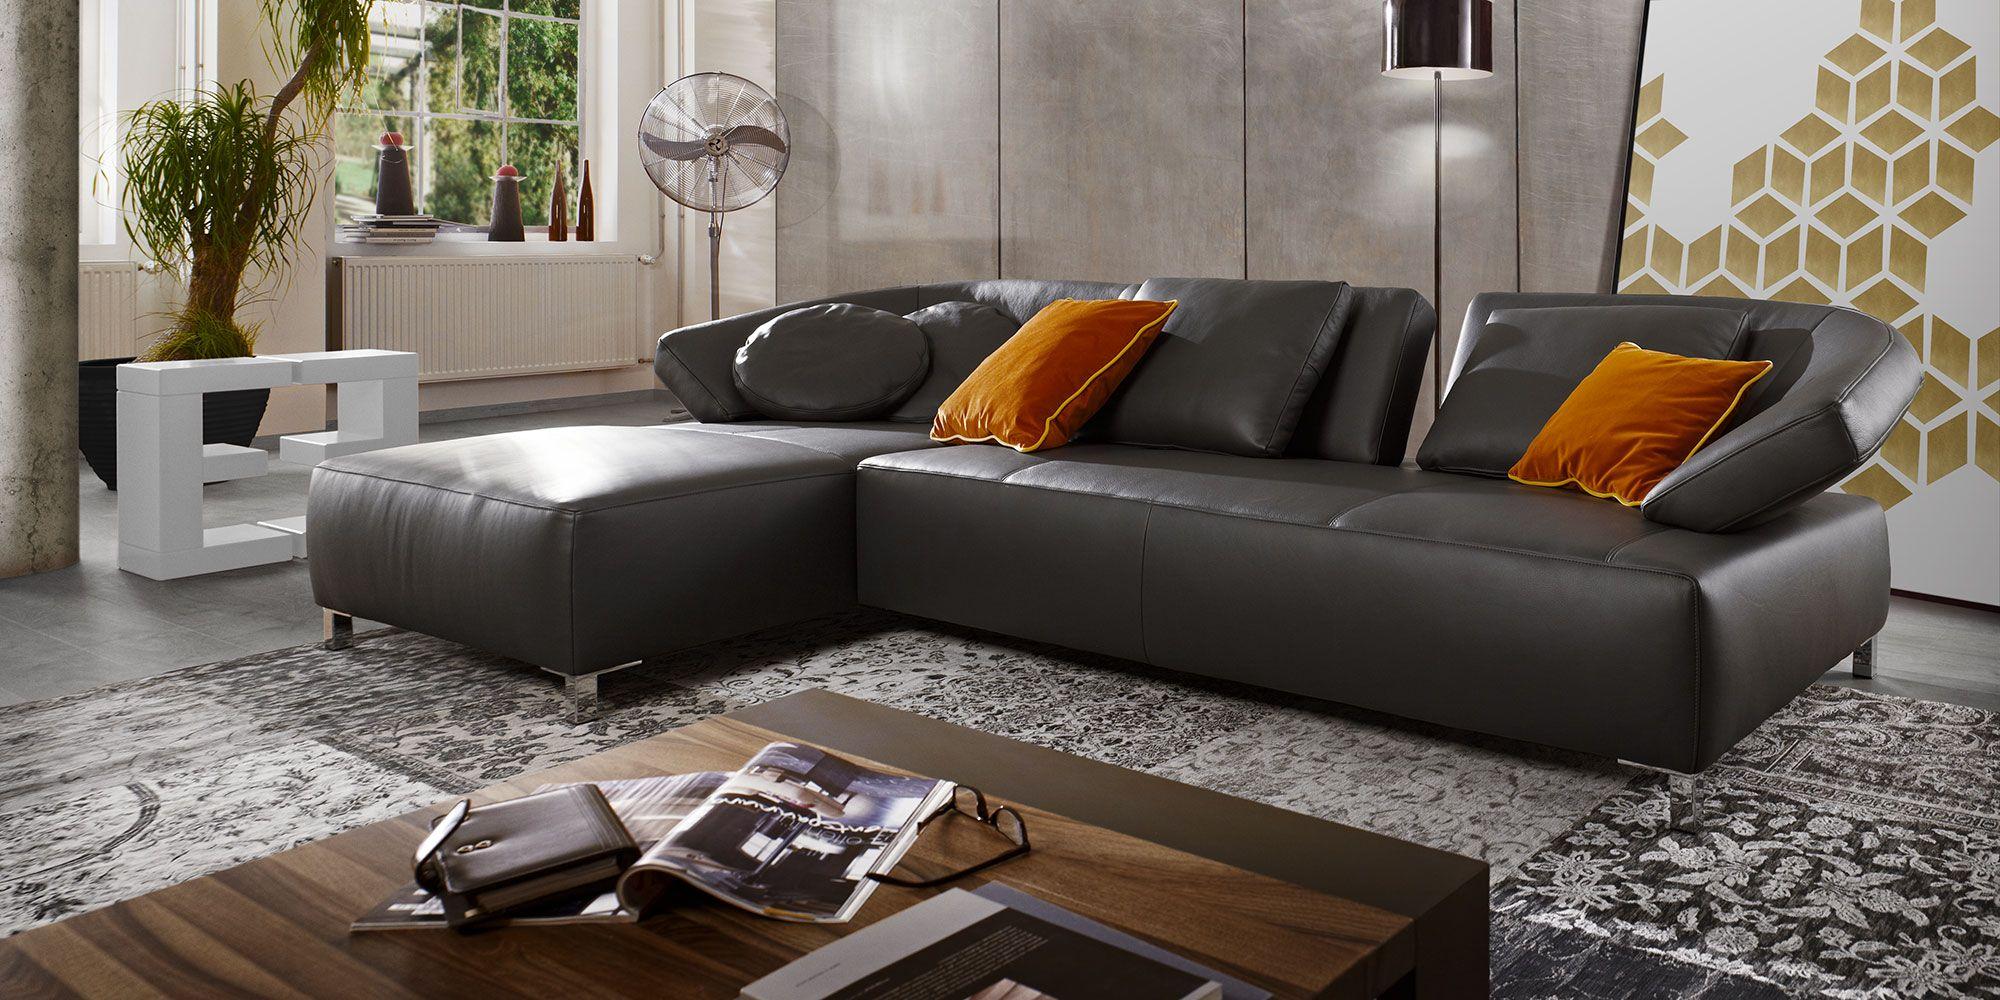 Butterfly Ewald Schillig Brand Comfortabele Banken Relax Bank